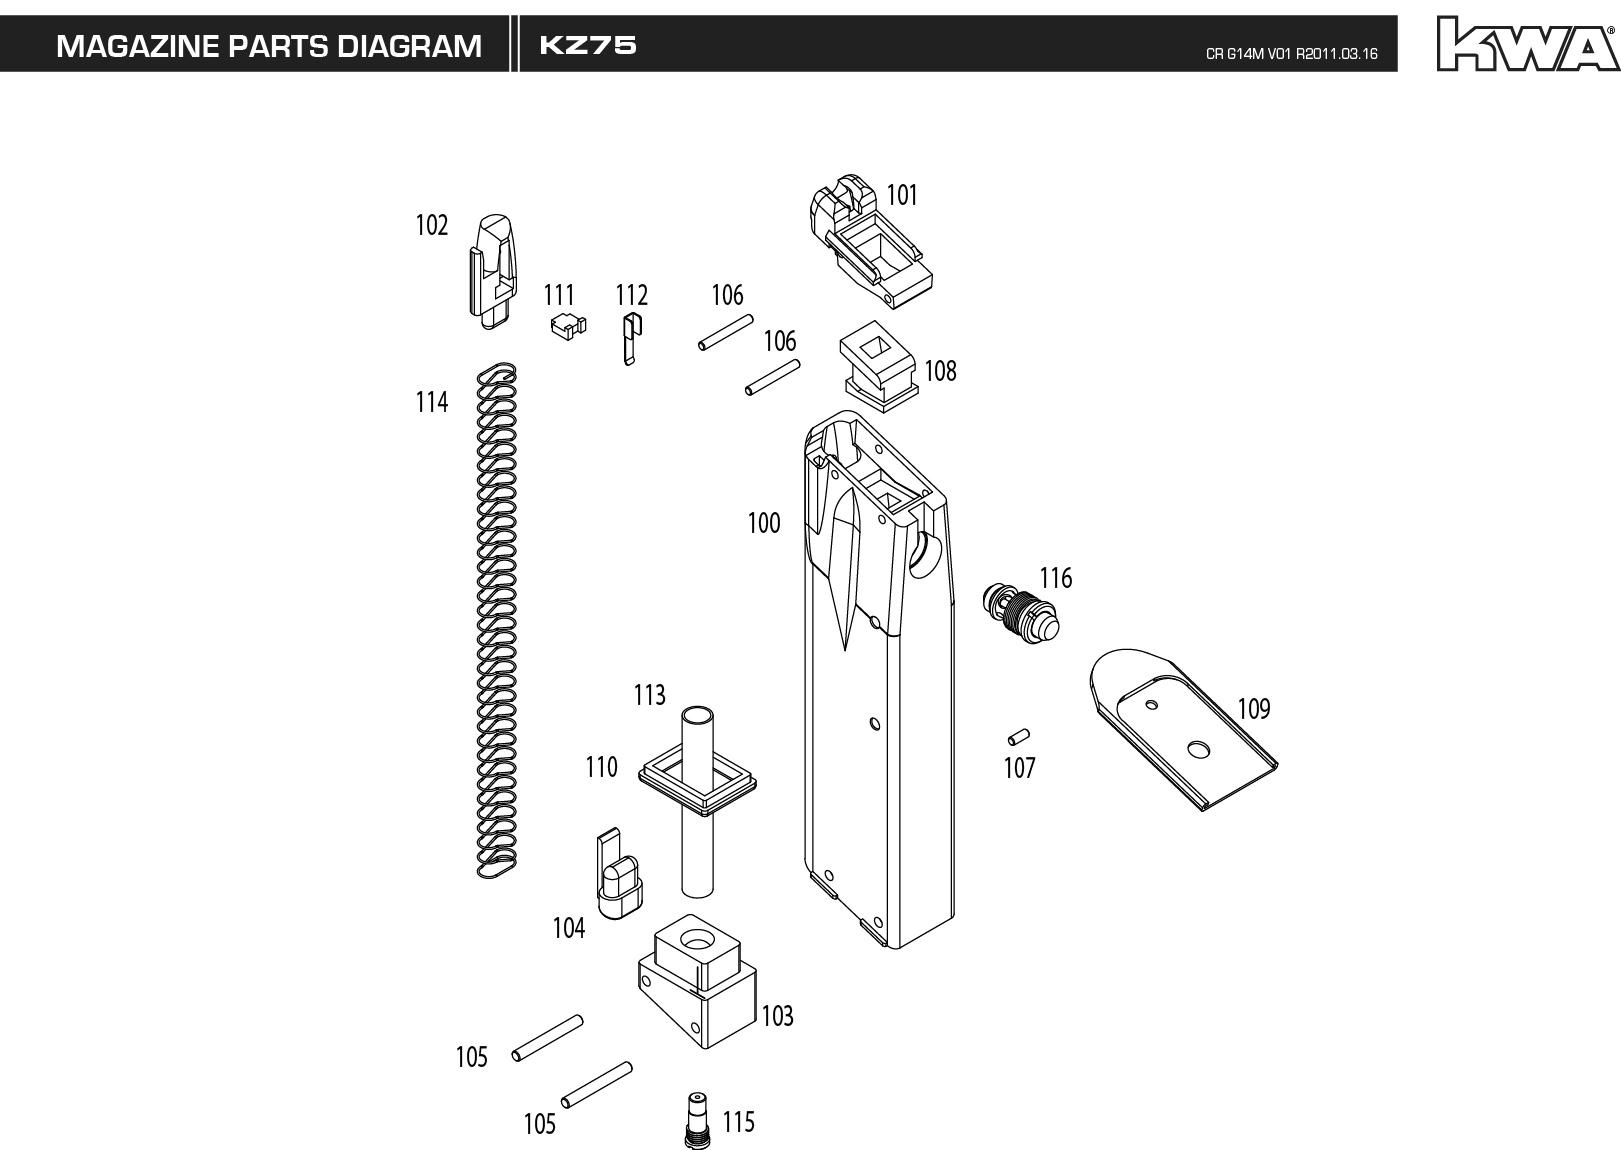 Kwa Mag Manual Kz75